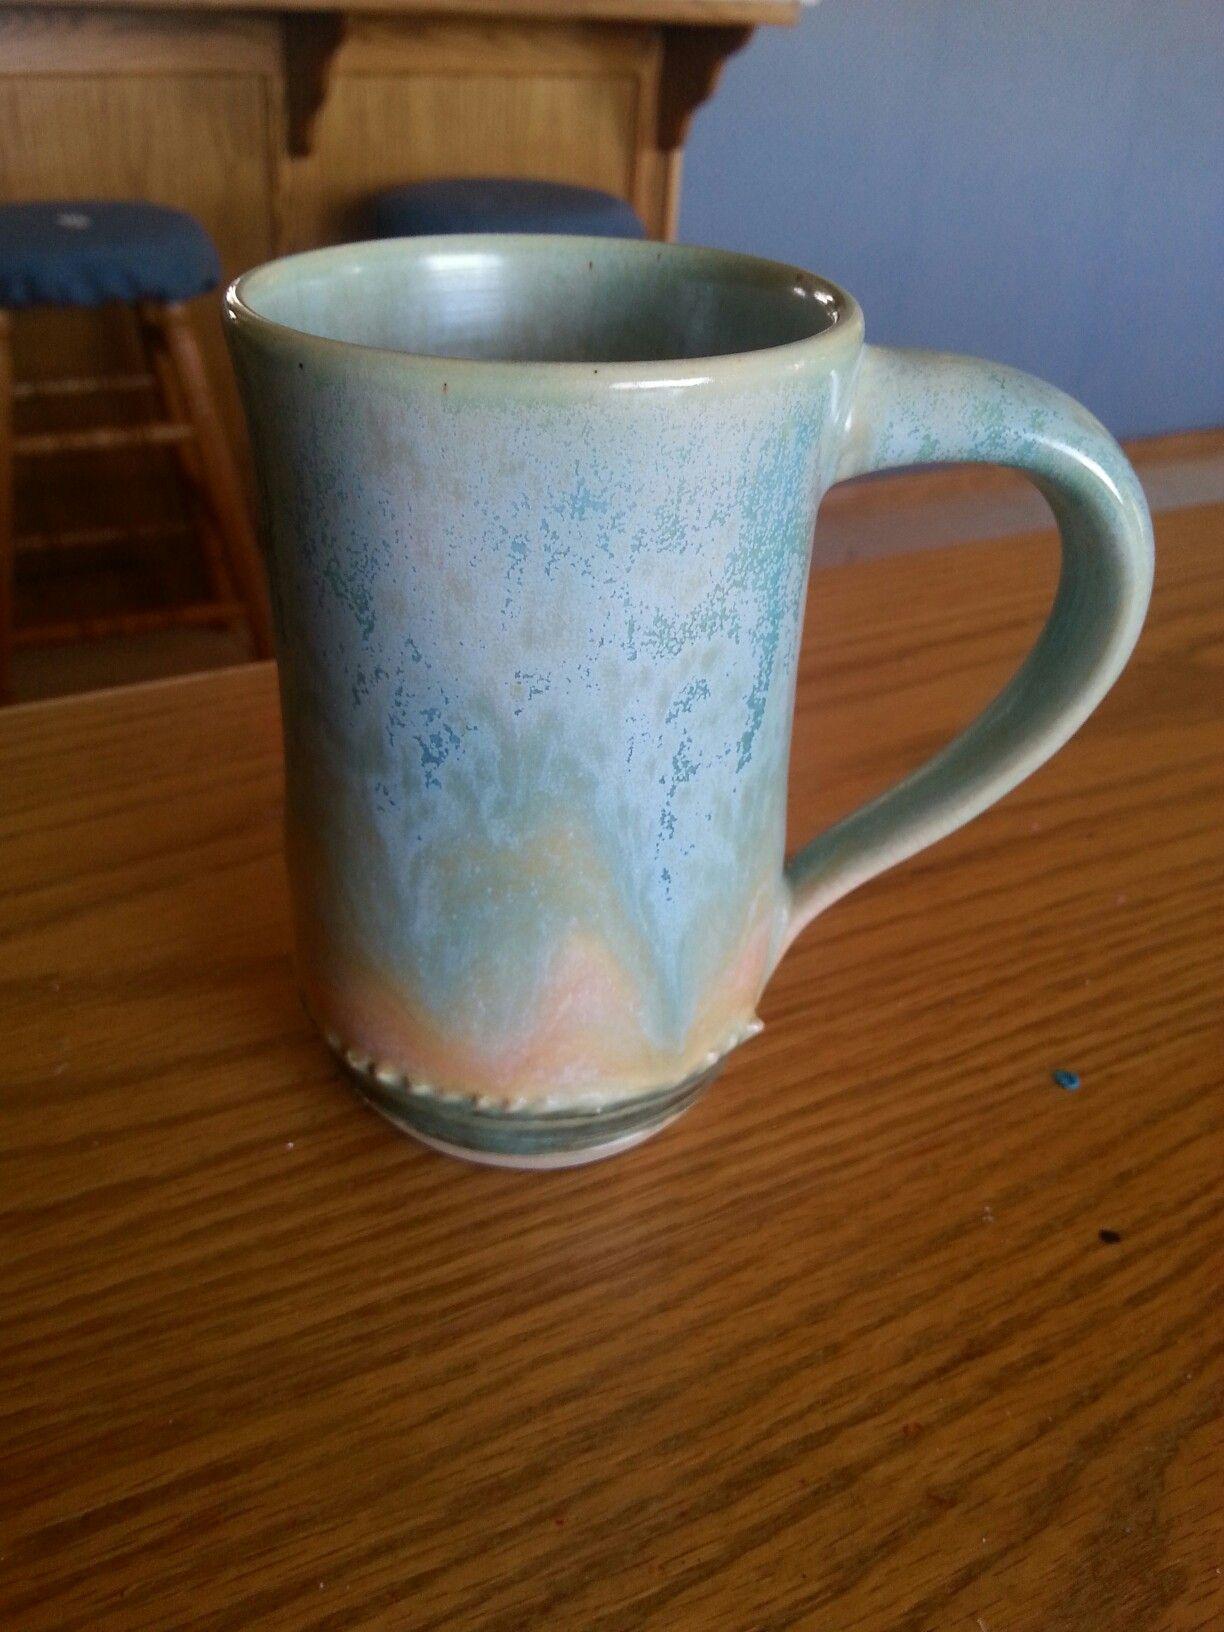 Coyote Mbg 035 026 Ceramics Glaze Glassware